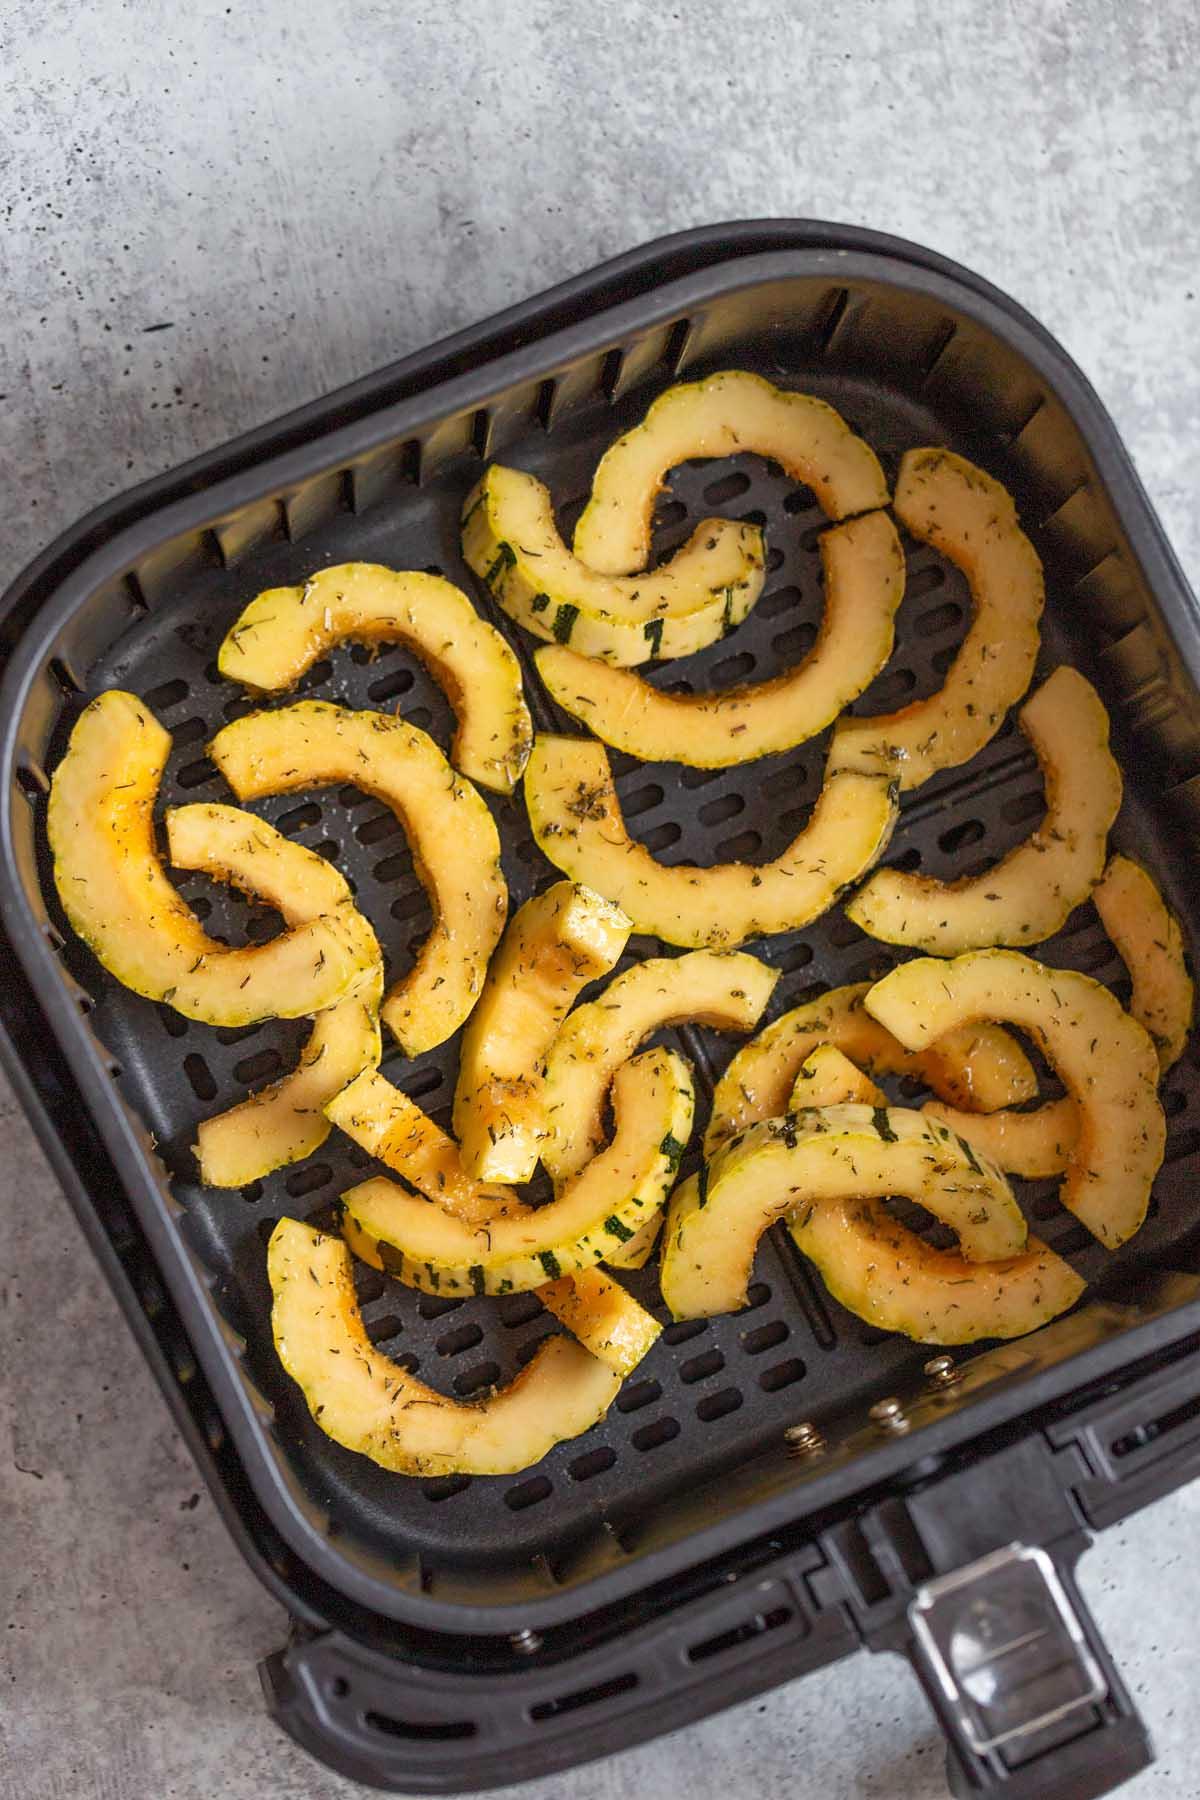 delicata squash in air fryer basket